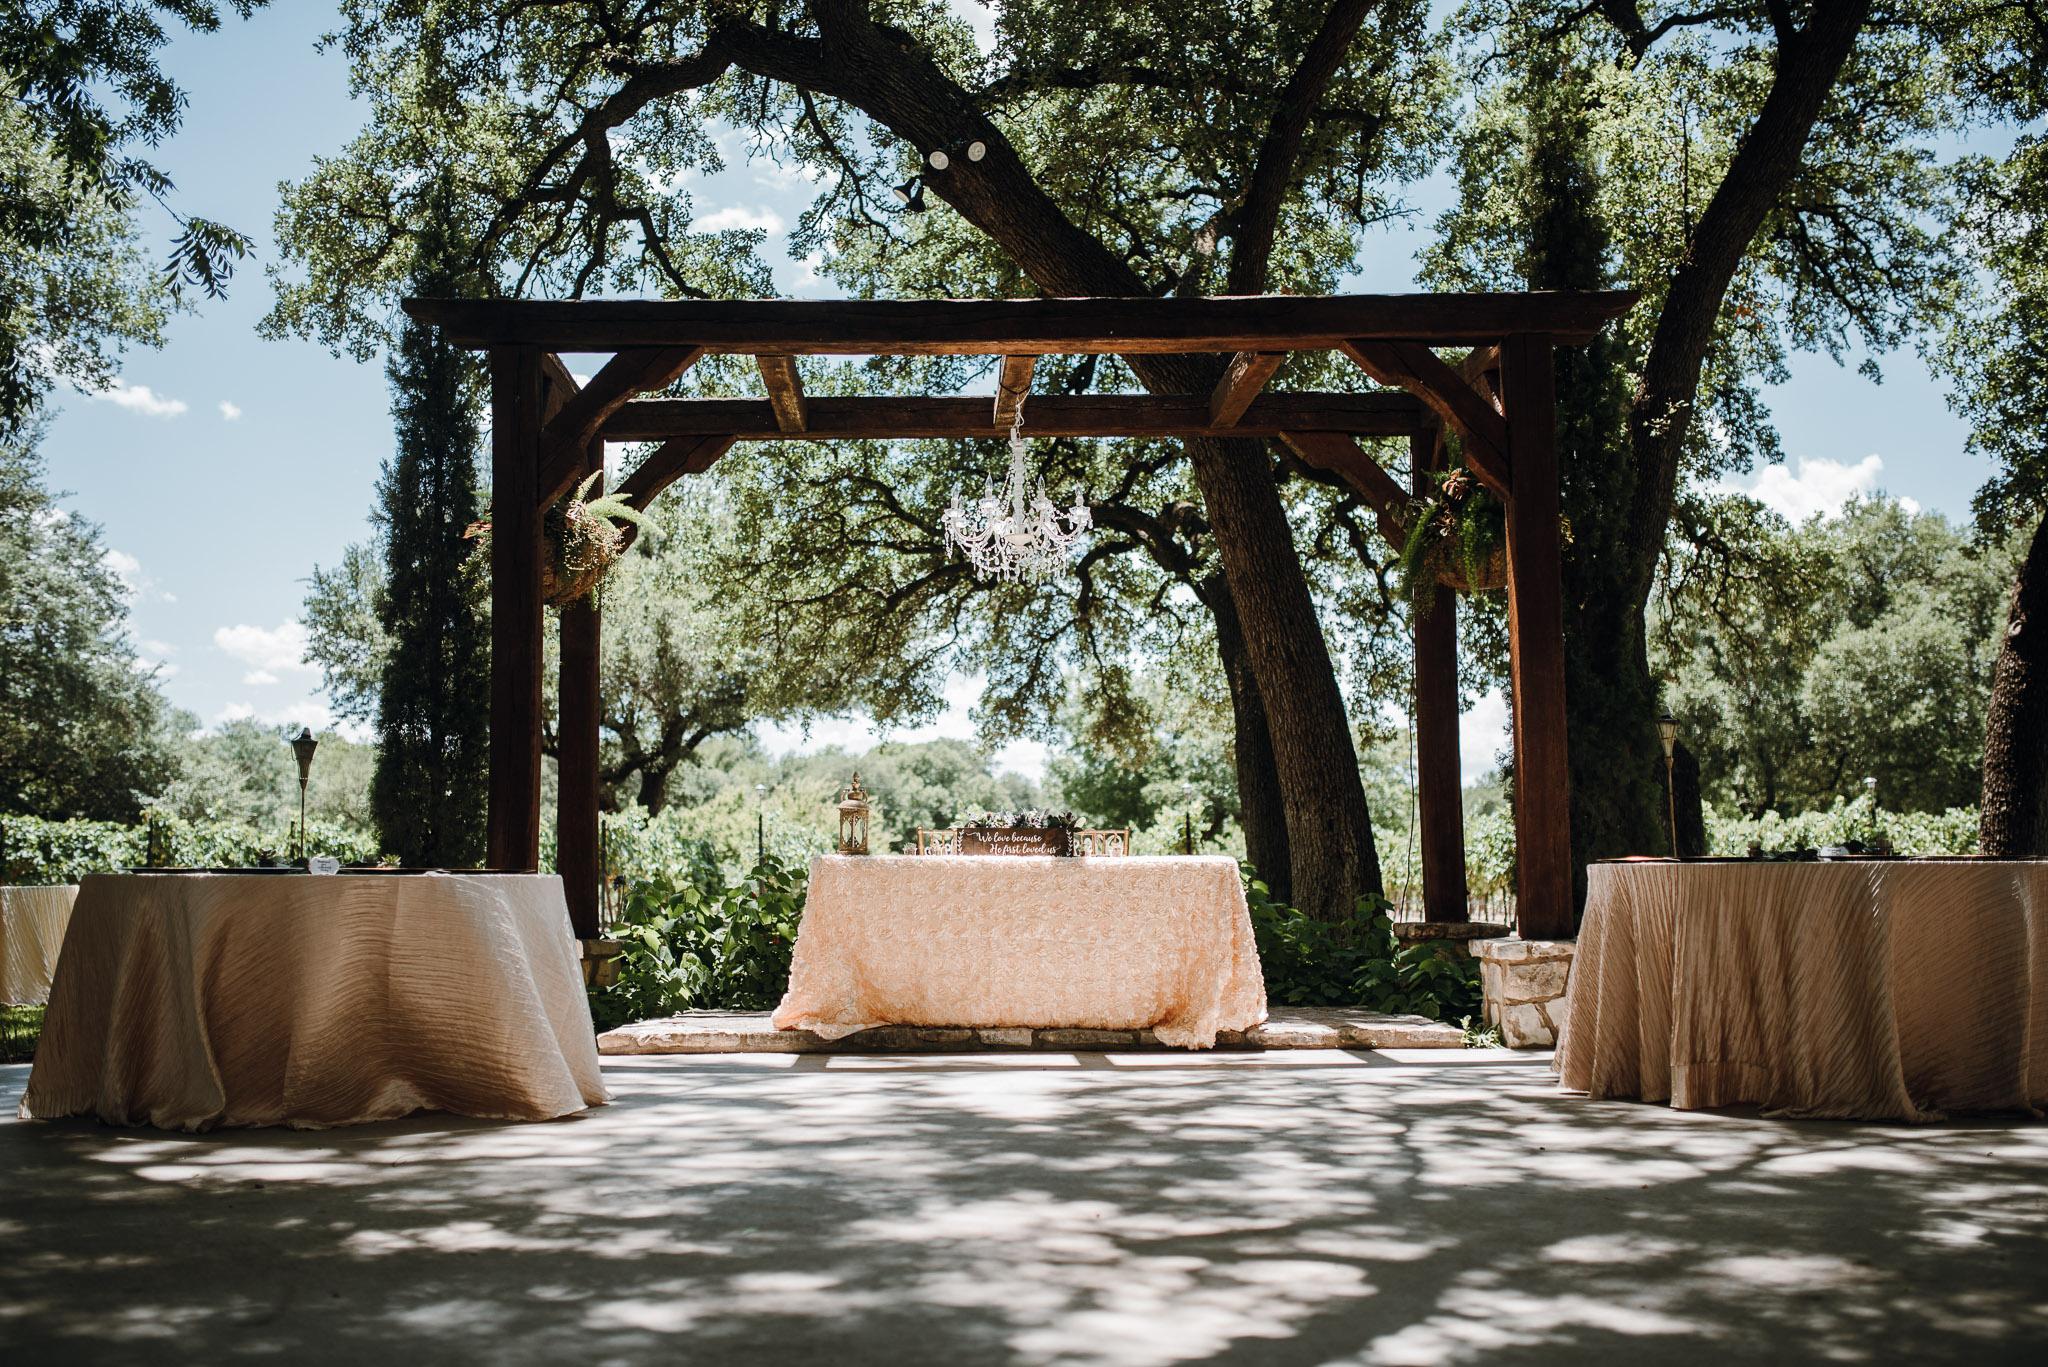 Chapel-In-The-Vineyard-Christoval-Vineyards-and-Winery-Wedding_Kayla&Eric-0026.jpg